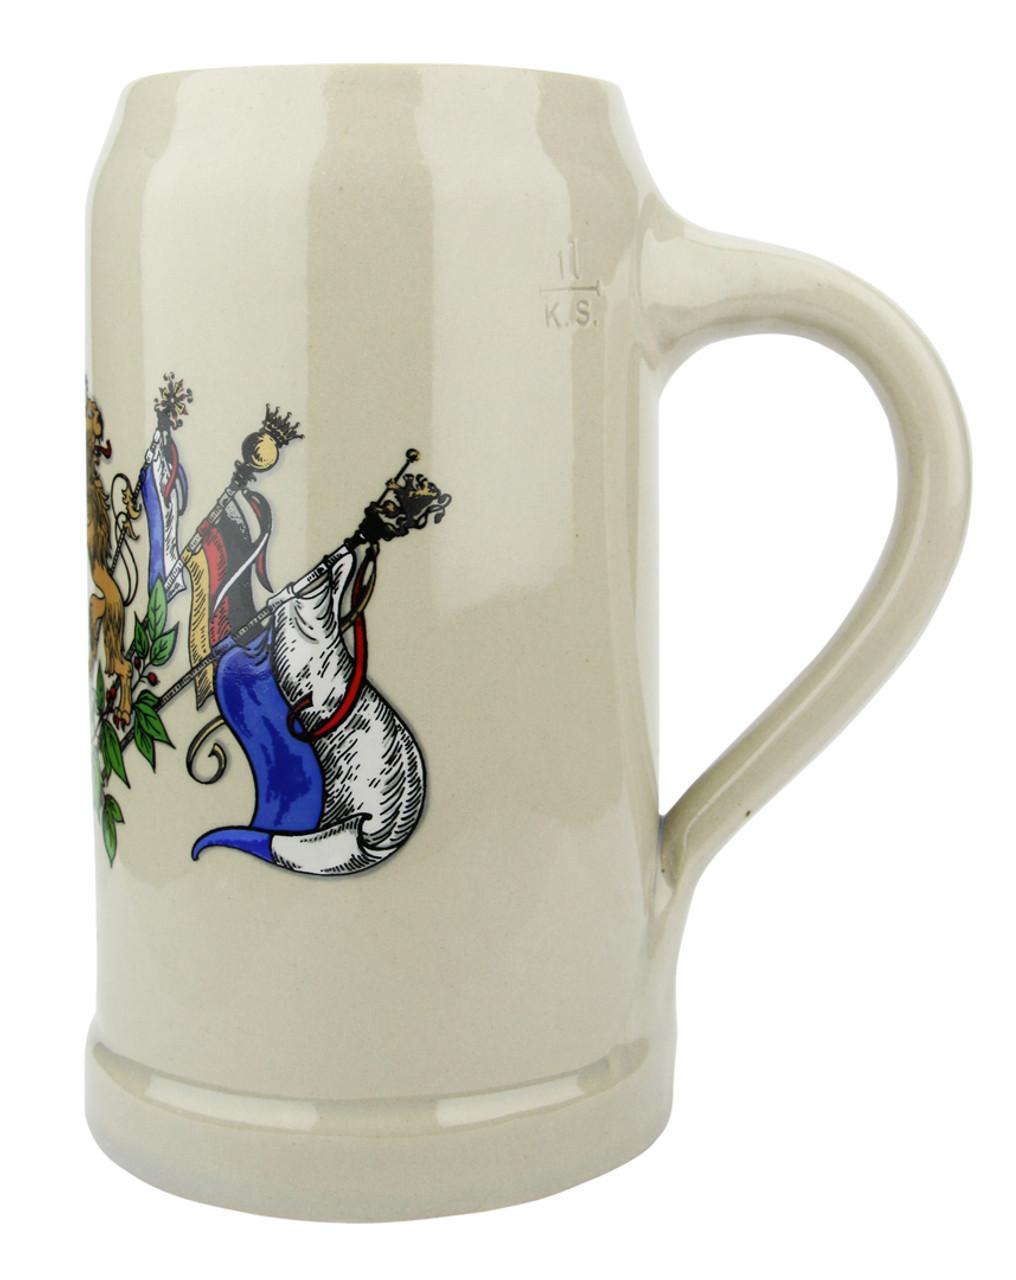 Bavaria Crest Stoneware Beer Mug 1 Liter